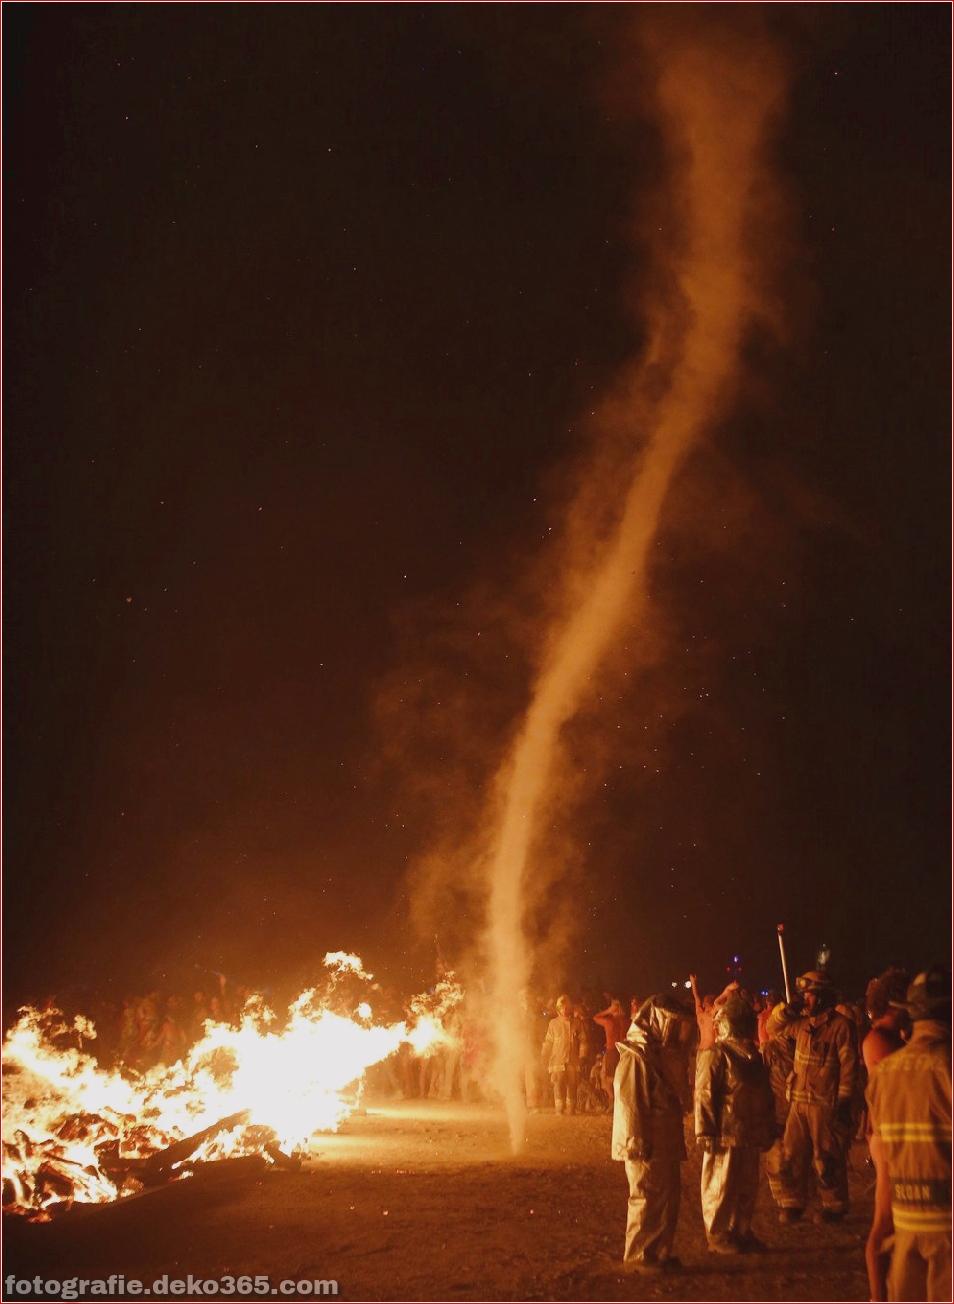 Fotografie des Burning Man Festivals_5c9007a745c89.jpg